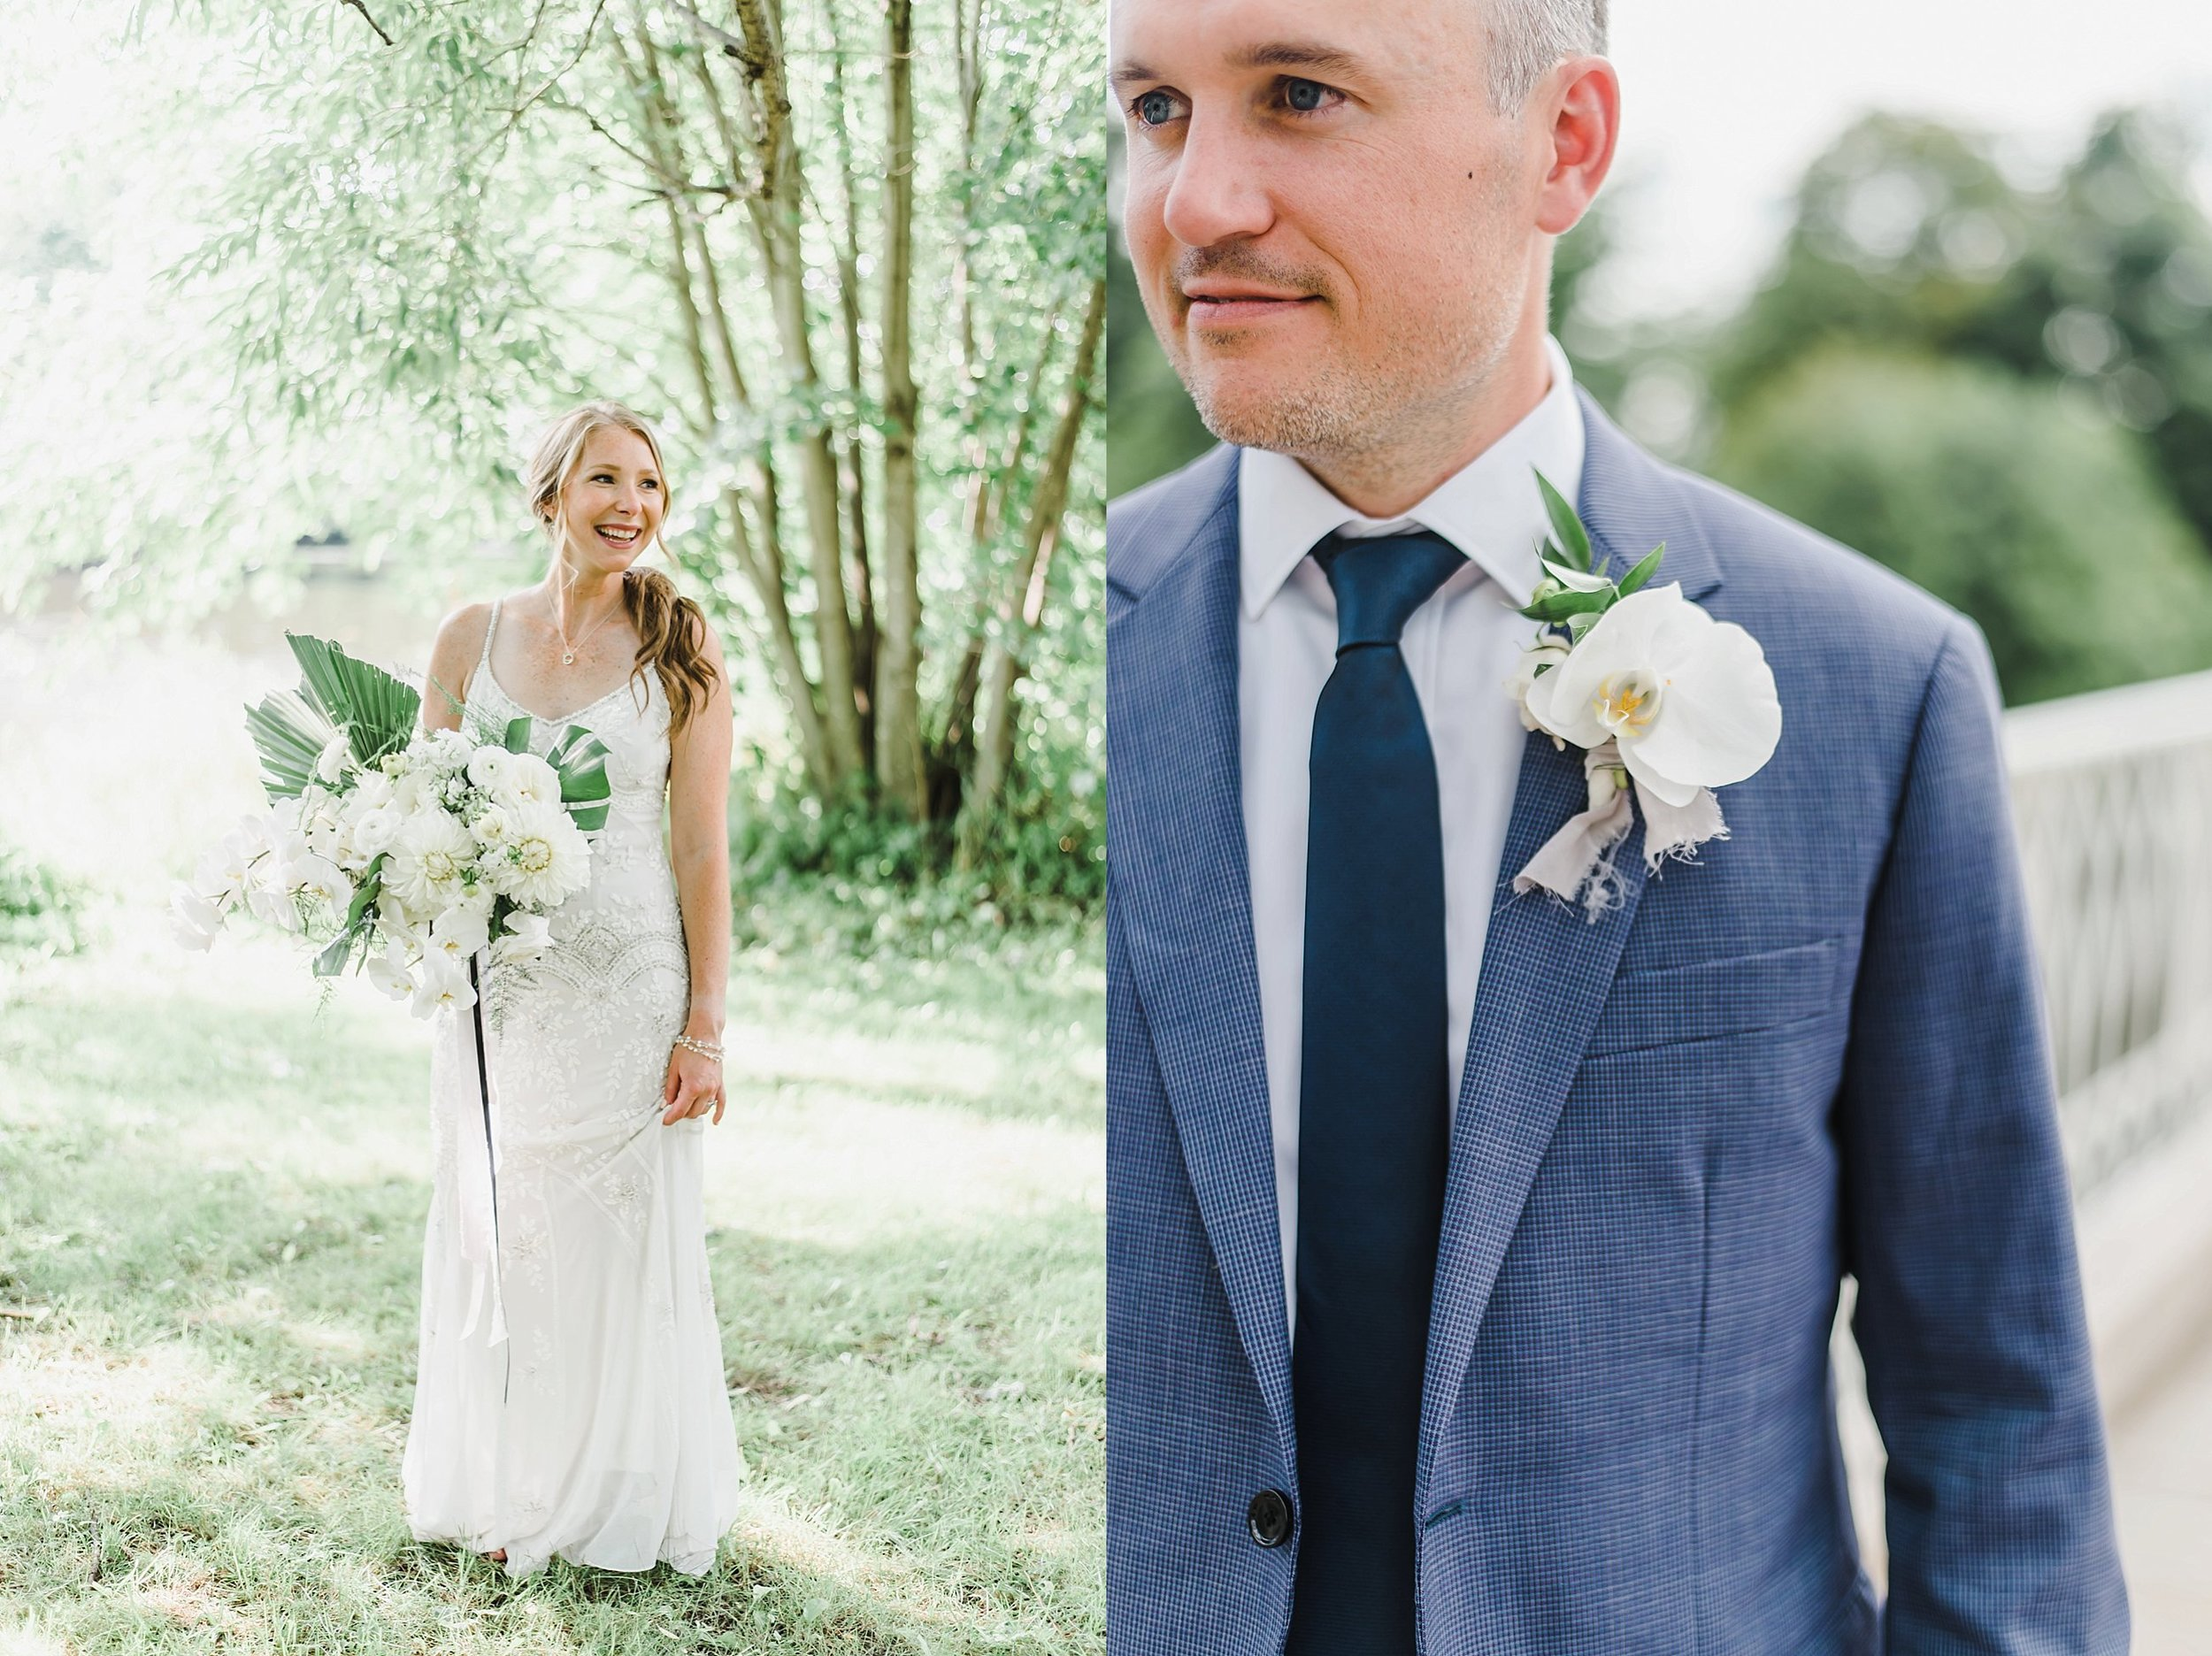 light airy indie fine art ottawa wedding photographer | Ali and Batoul Photography_0663.jpg